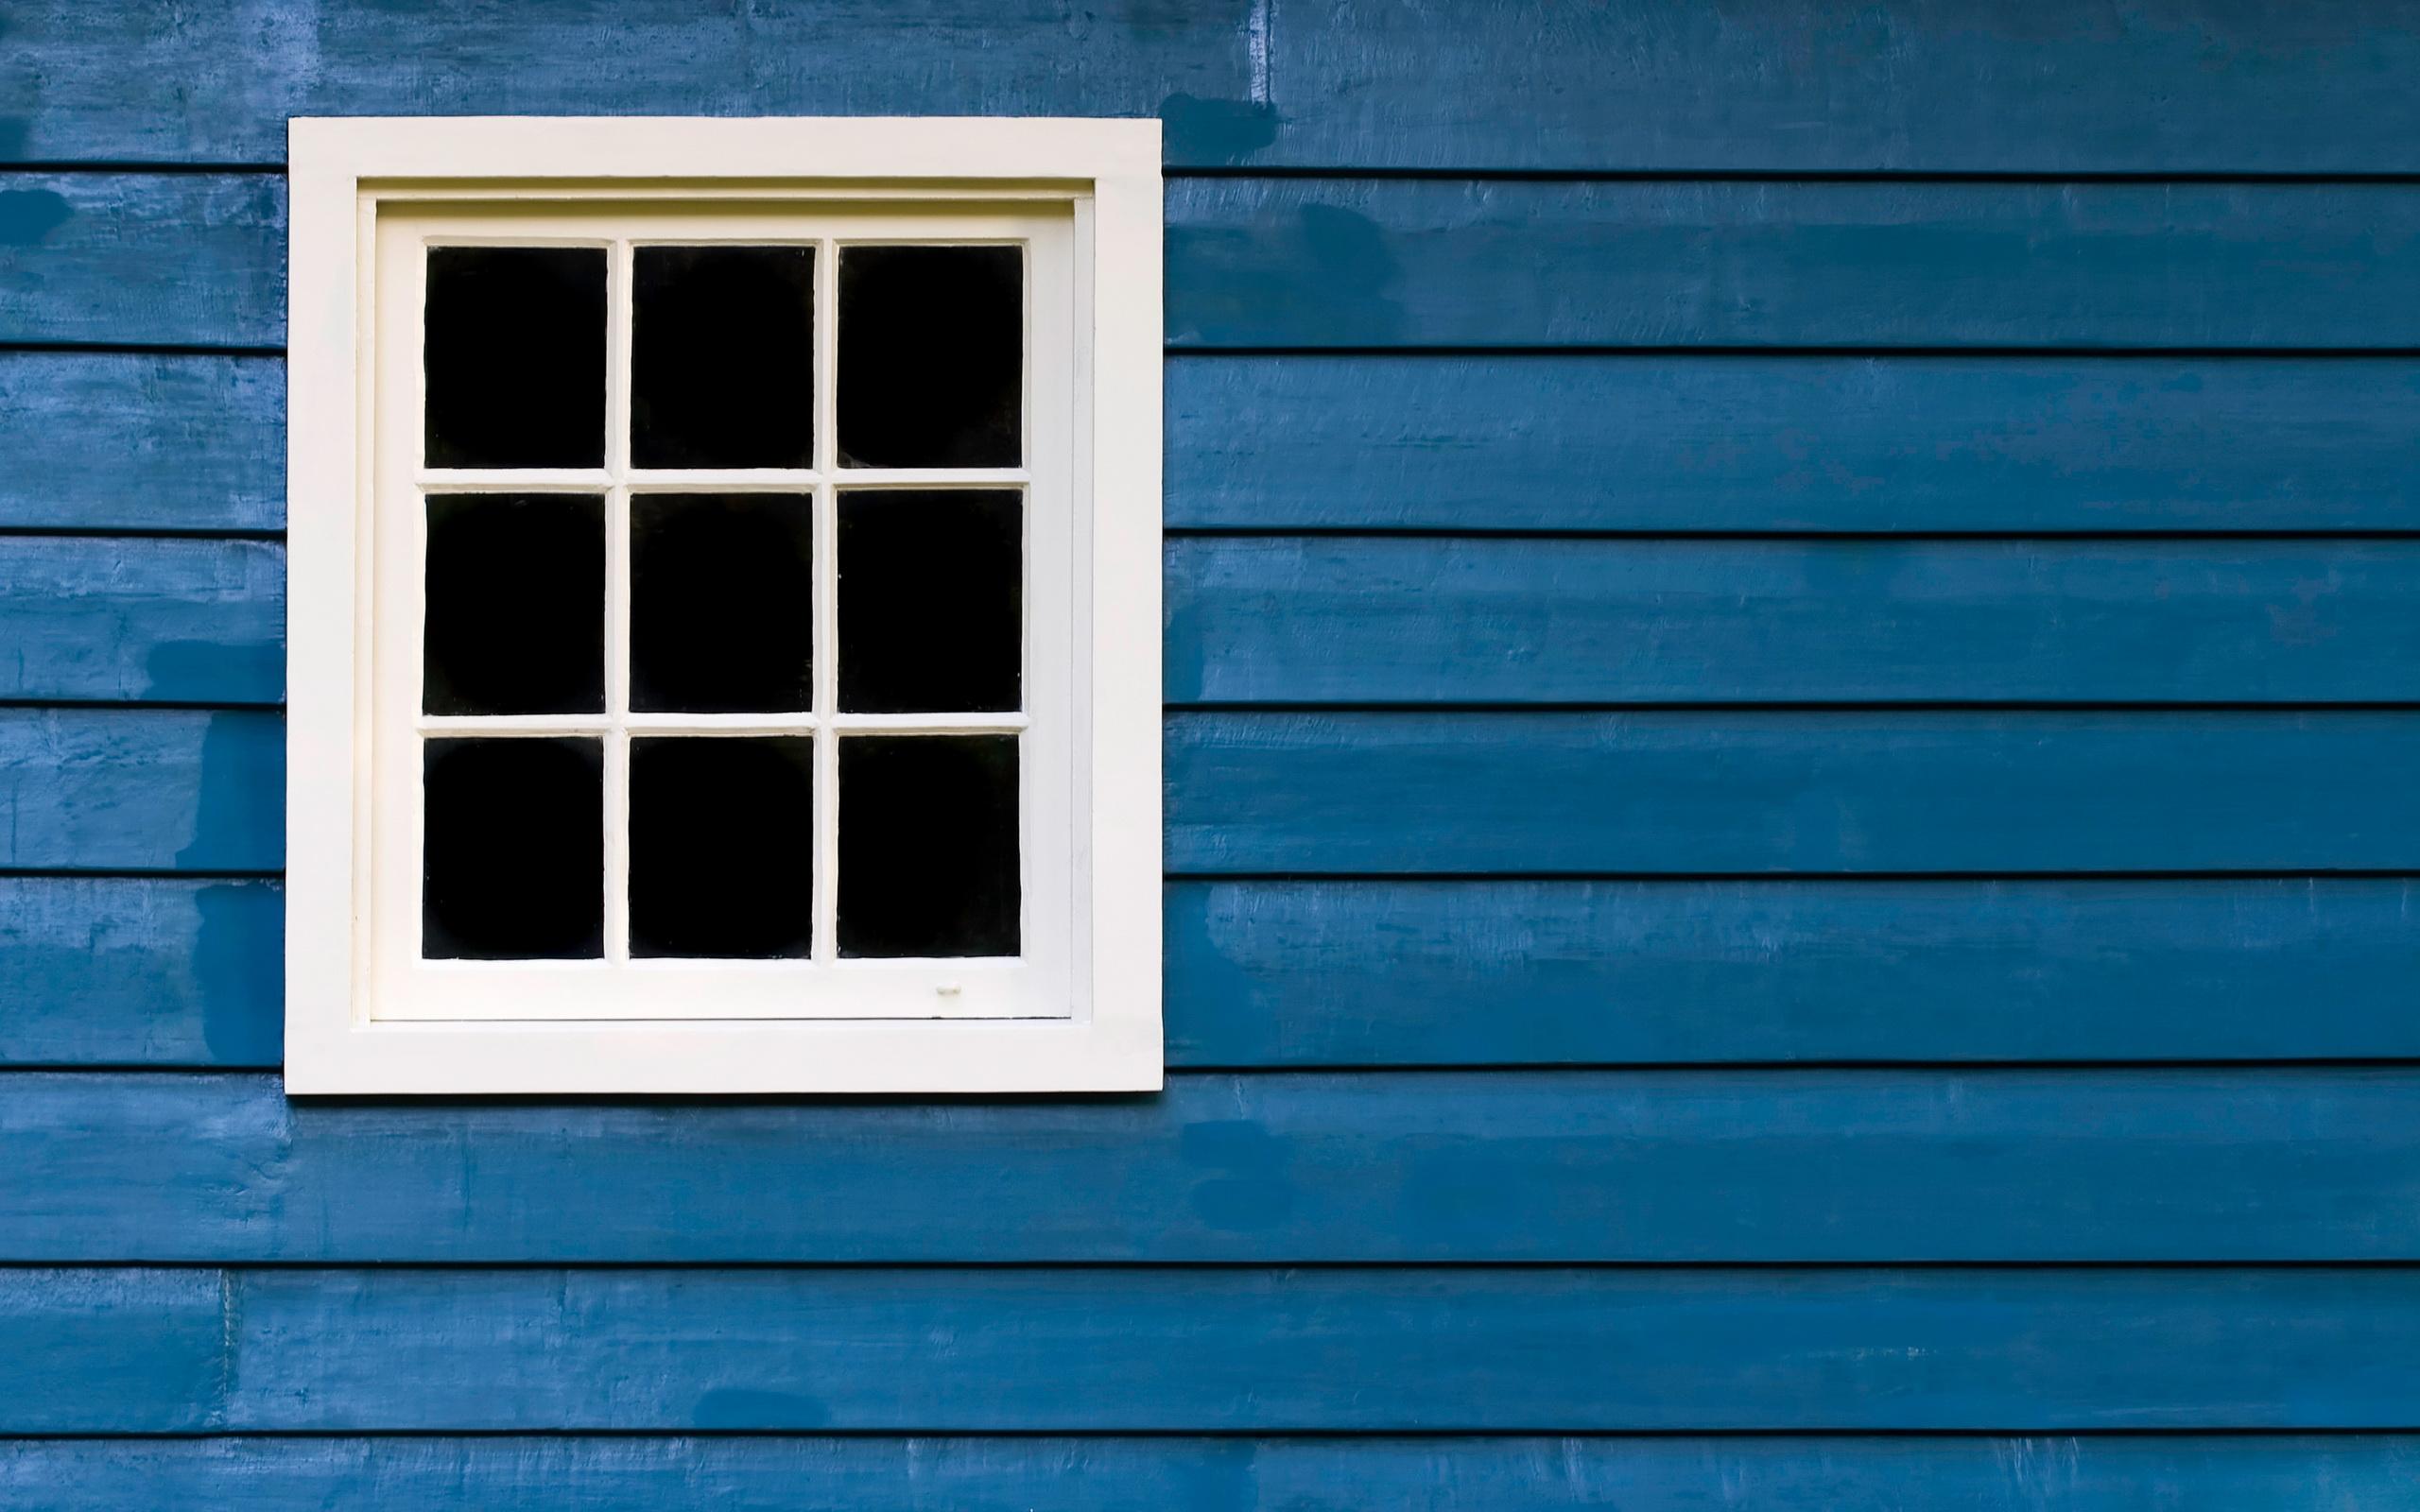 window hd wallpaper | background image | 2560x1600 | id:439159